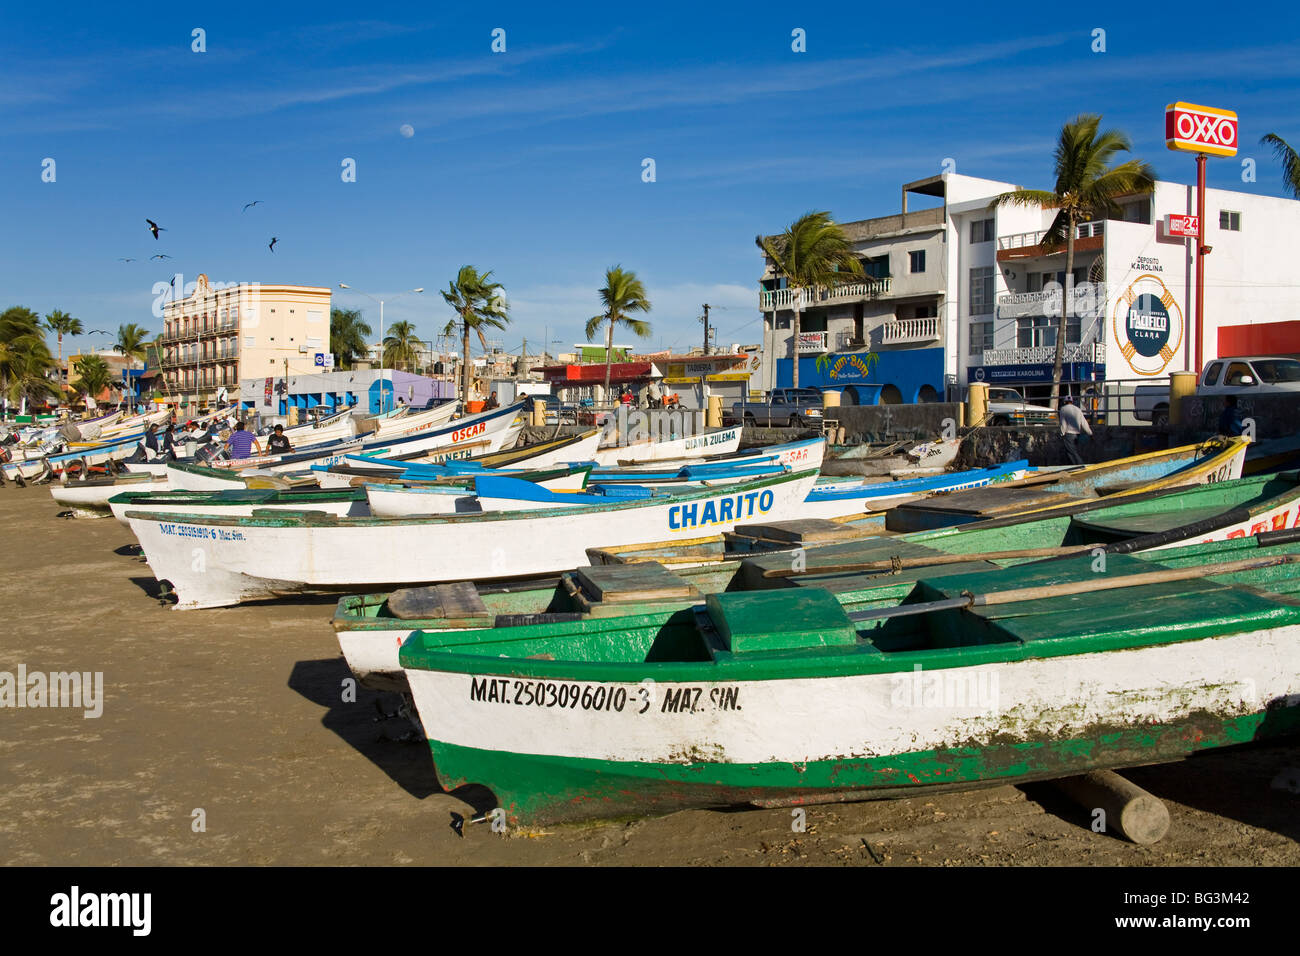 Fishing Boats on Playa Norte, Mazatlan, Sinaloa State, Mexico, North America Stock Photo